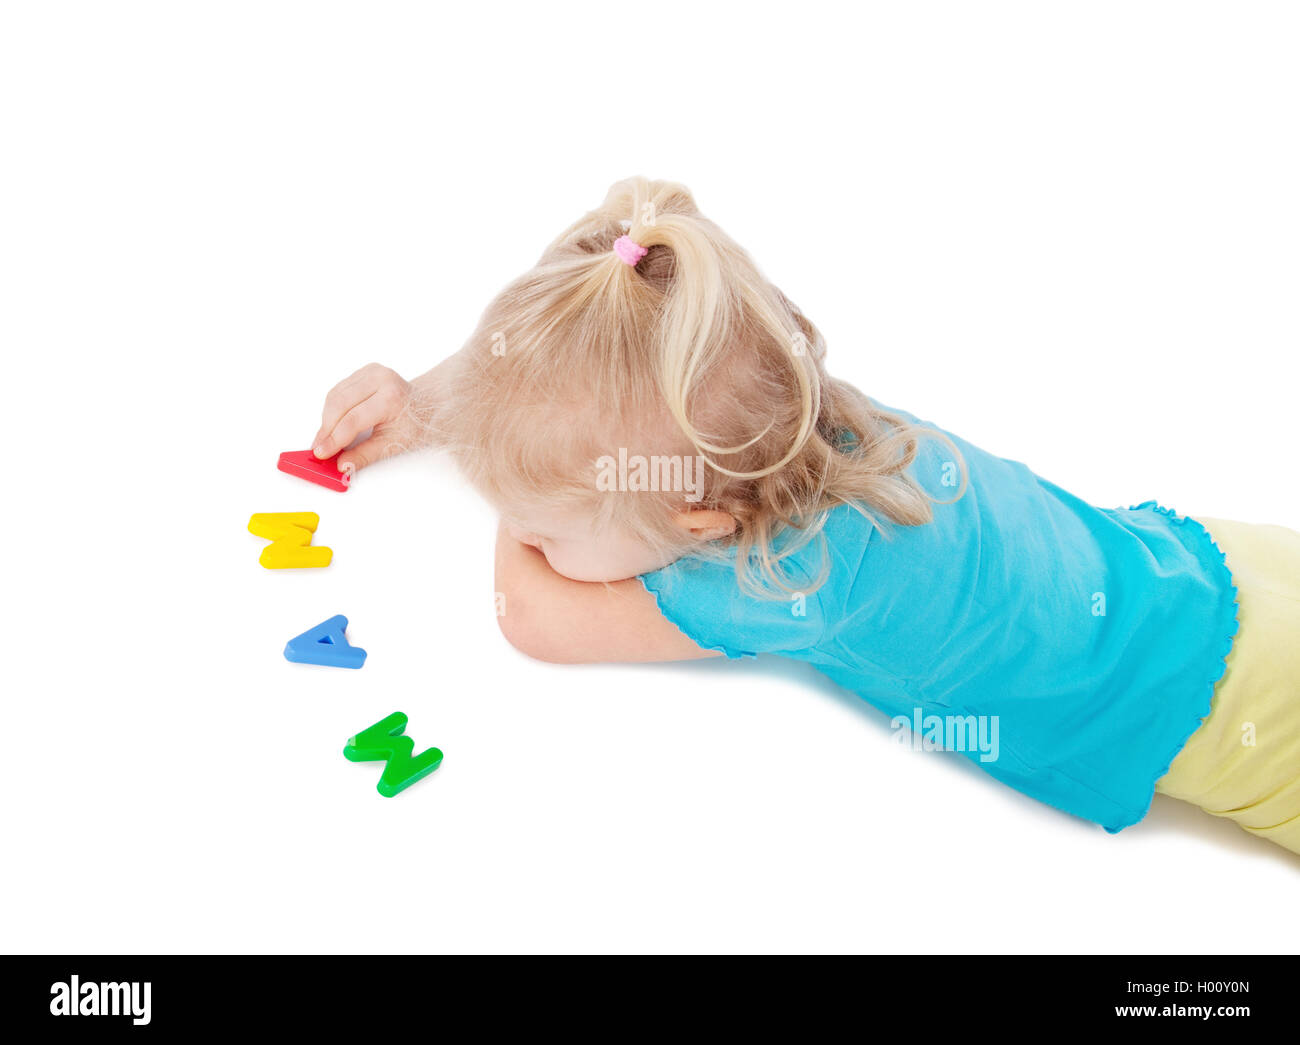 young girl writing word mama on white floor - Stock Image